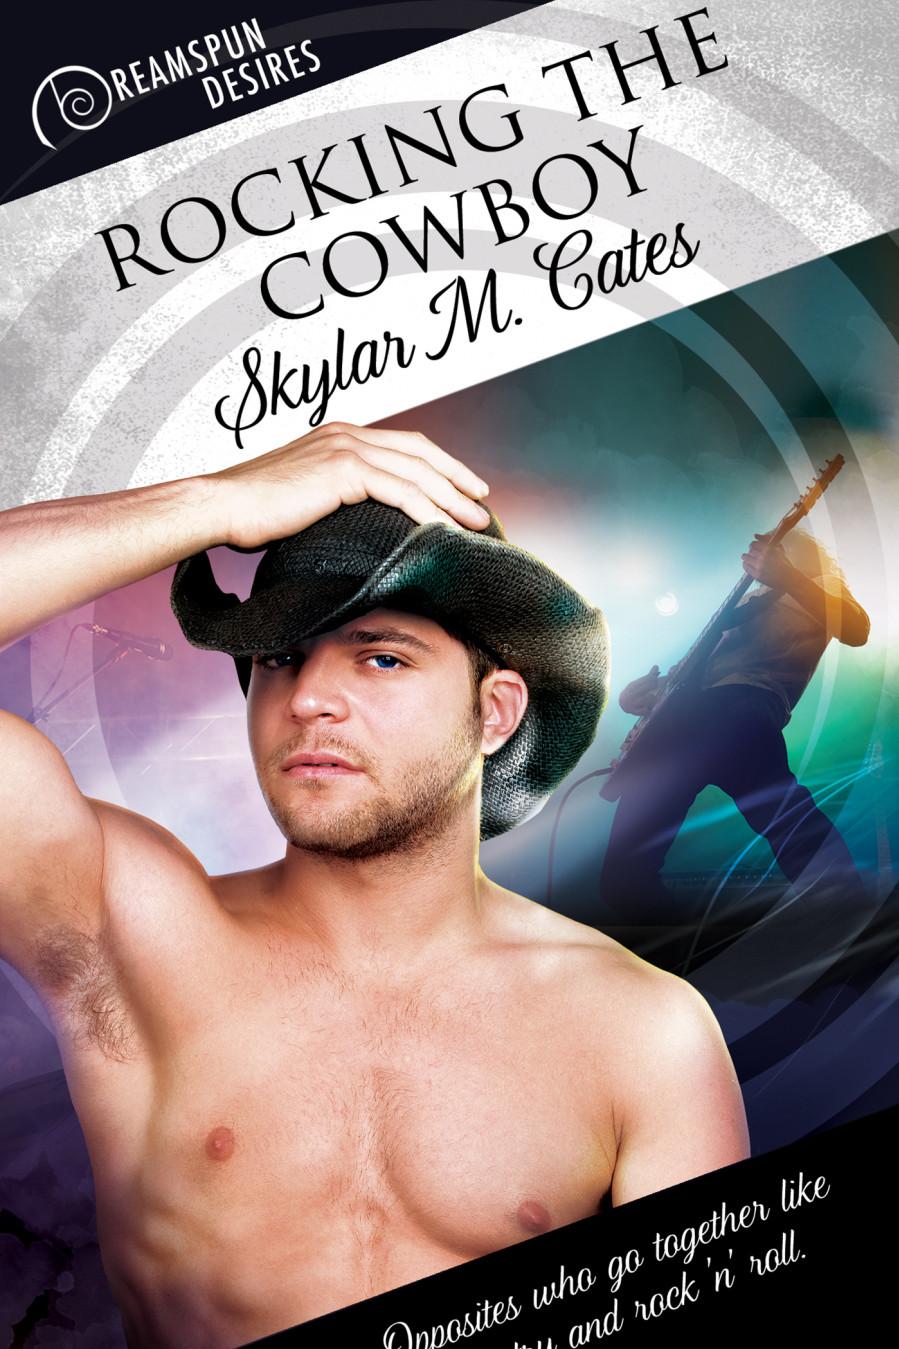 Rocking the Cowboy